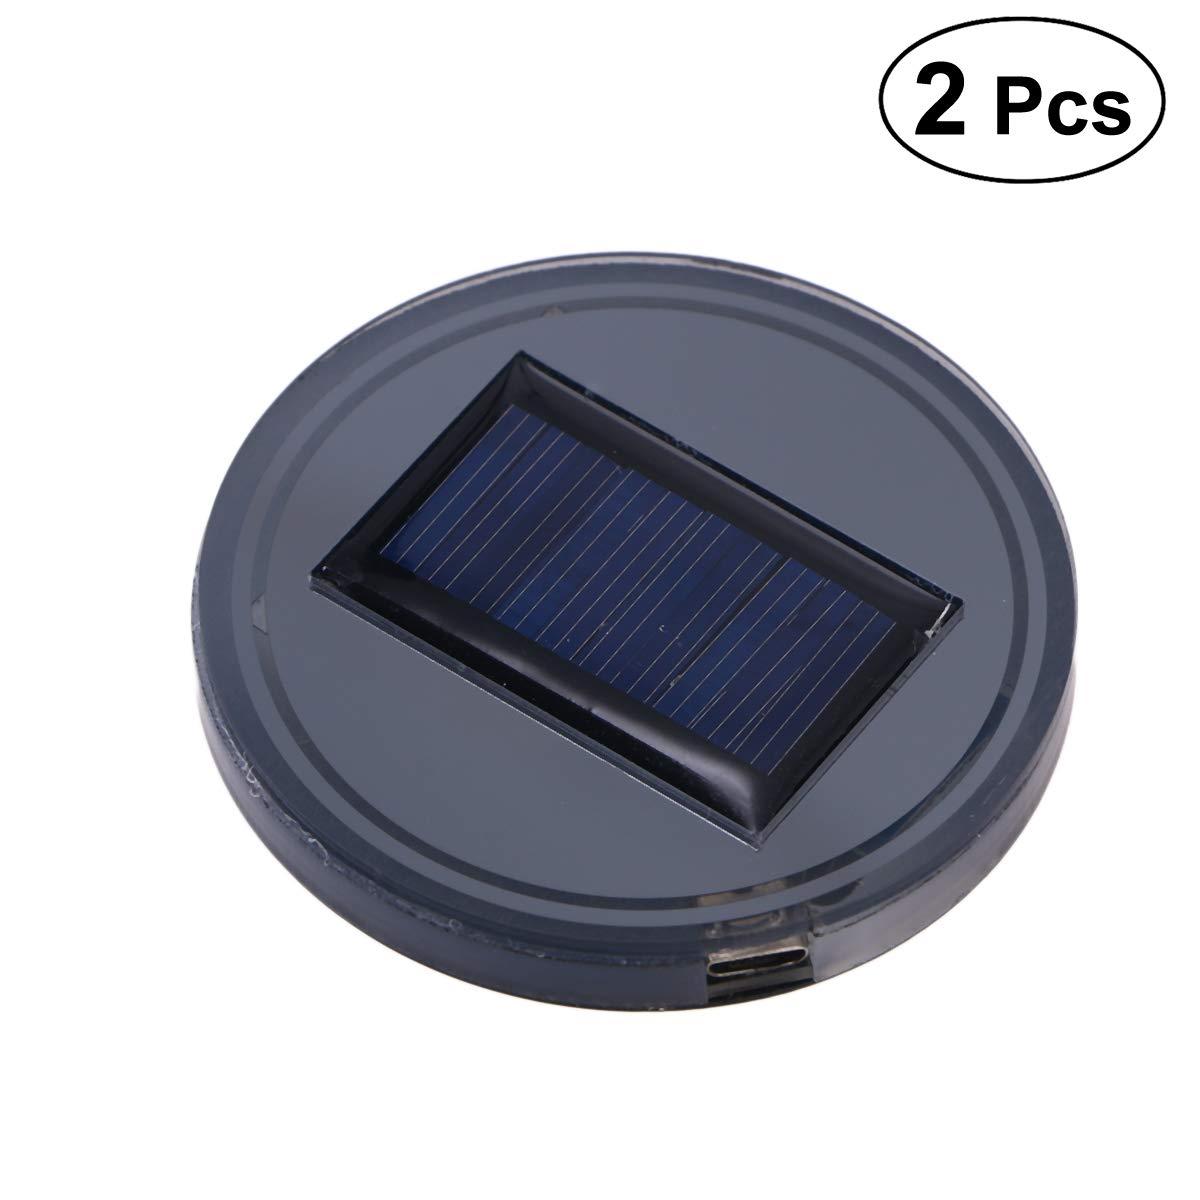 Vosarea 2pcs Solar Led Cup Holder Lights for Car with USB